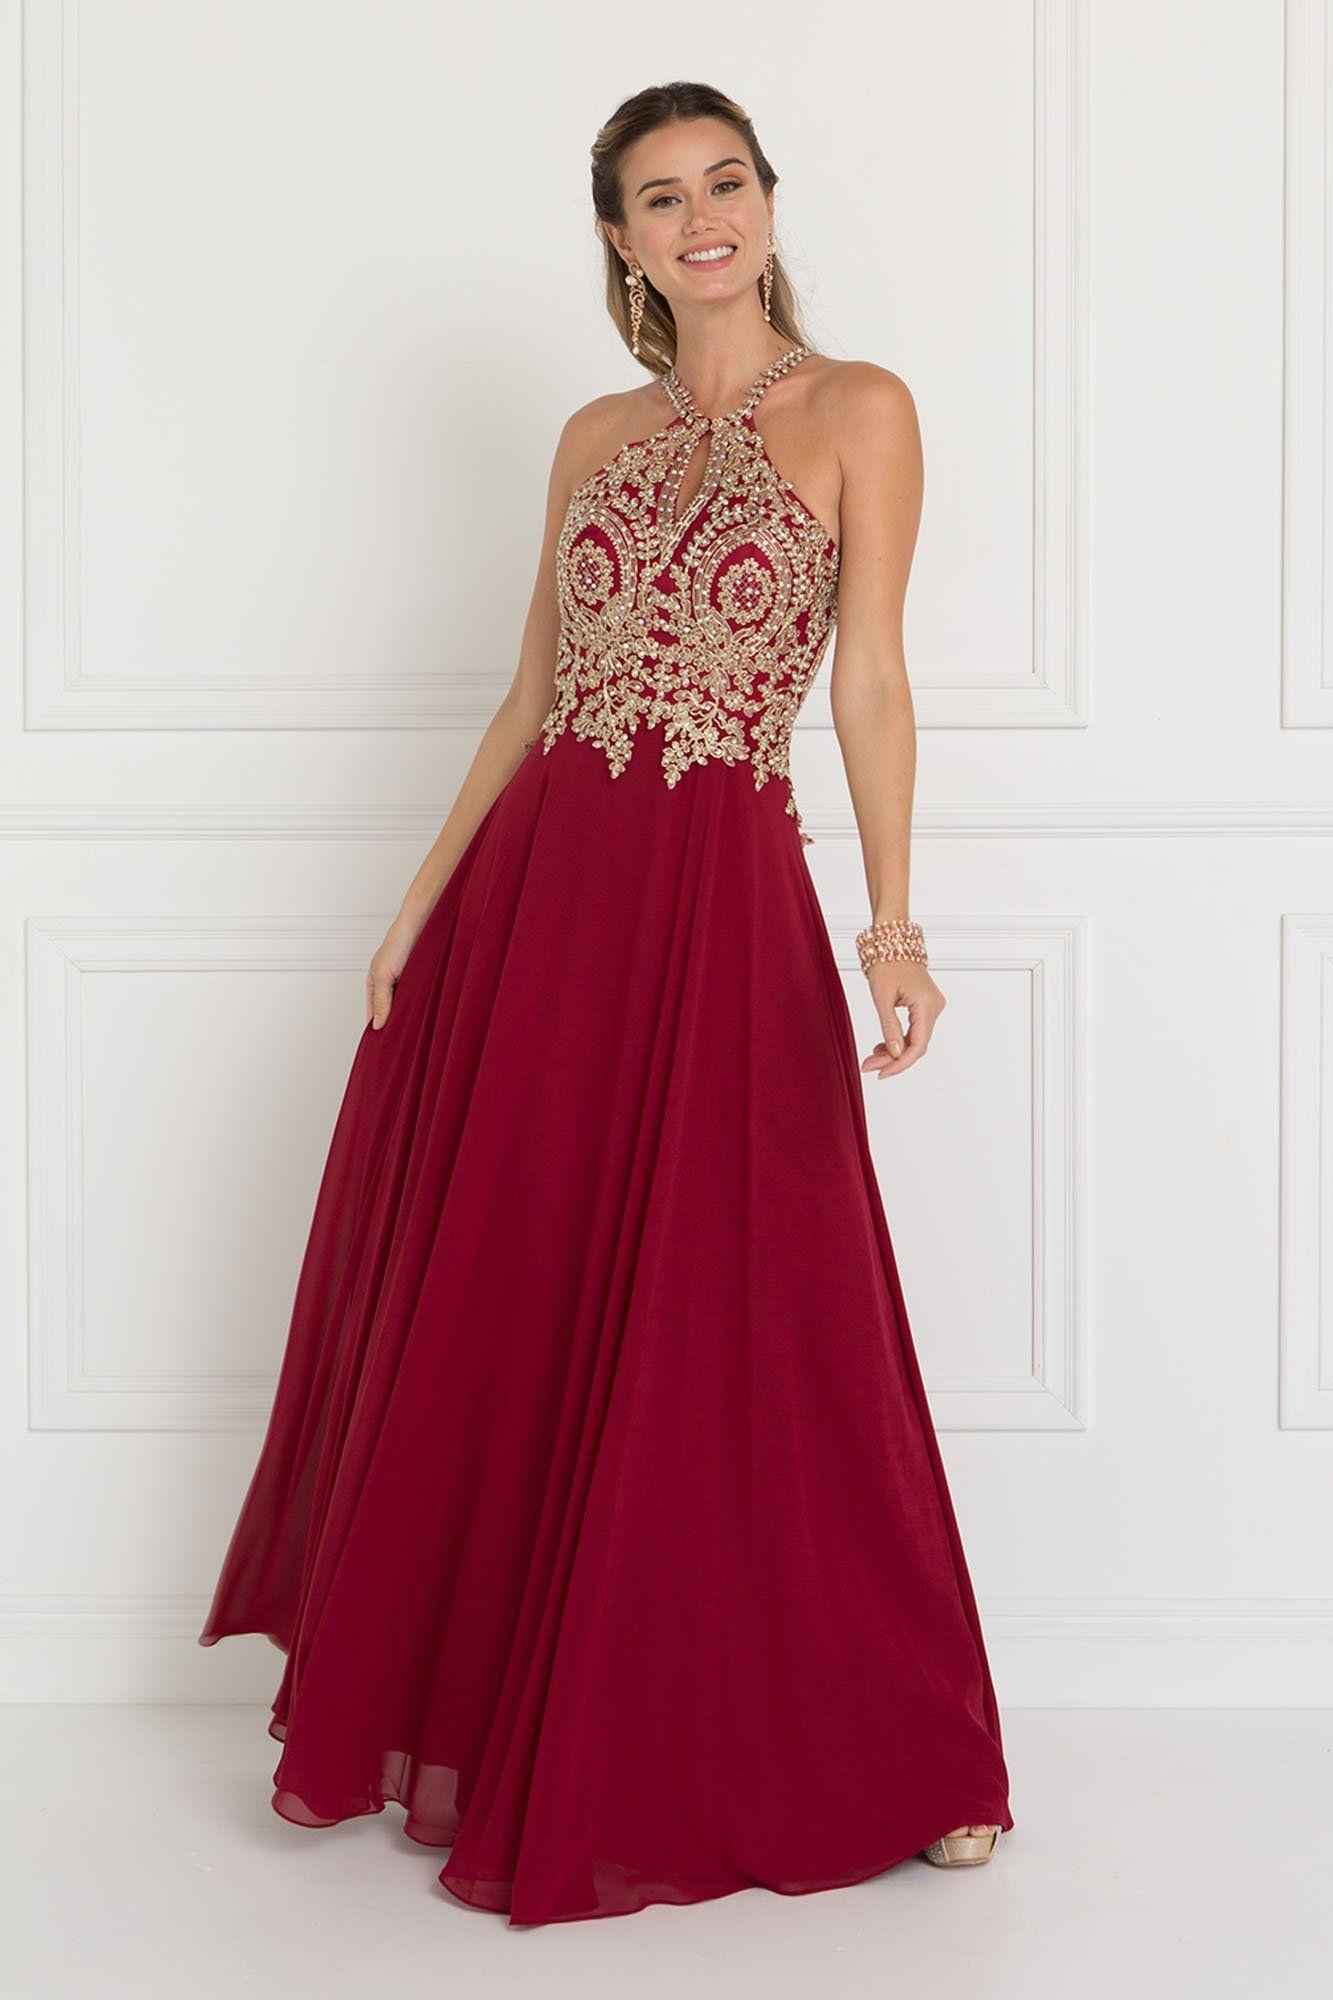 65b14fd2011 Burgundy long prom dress GLS 1526 in 2019